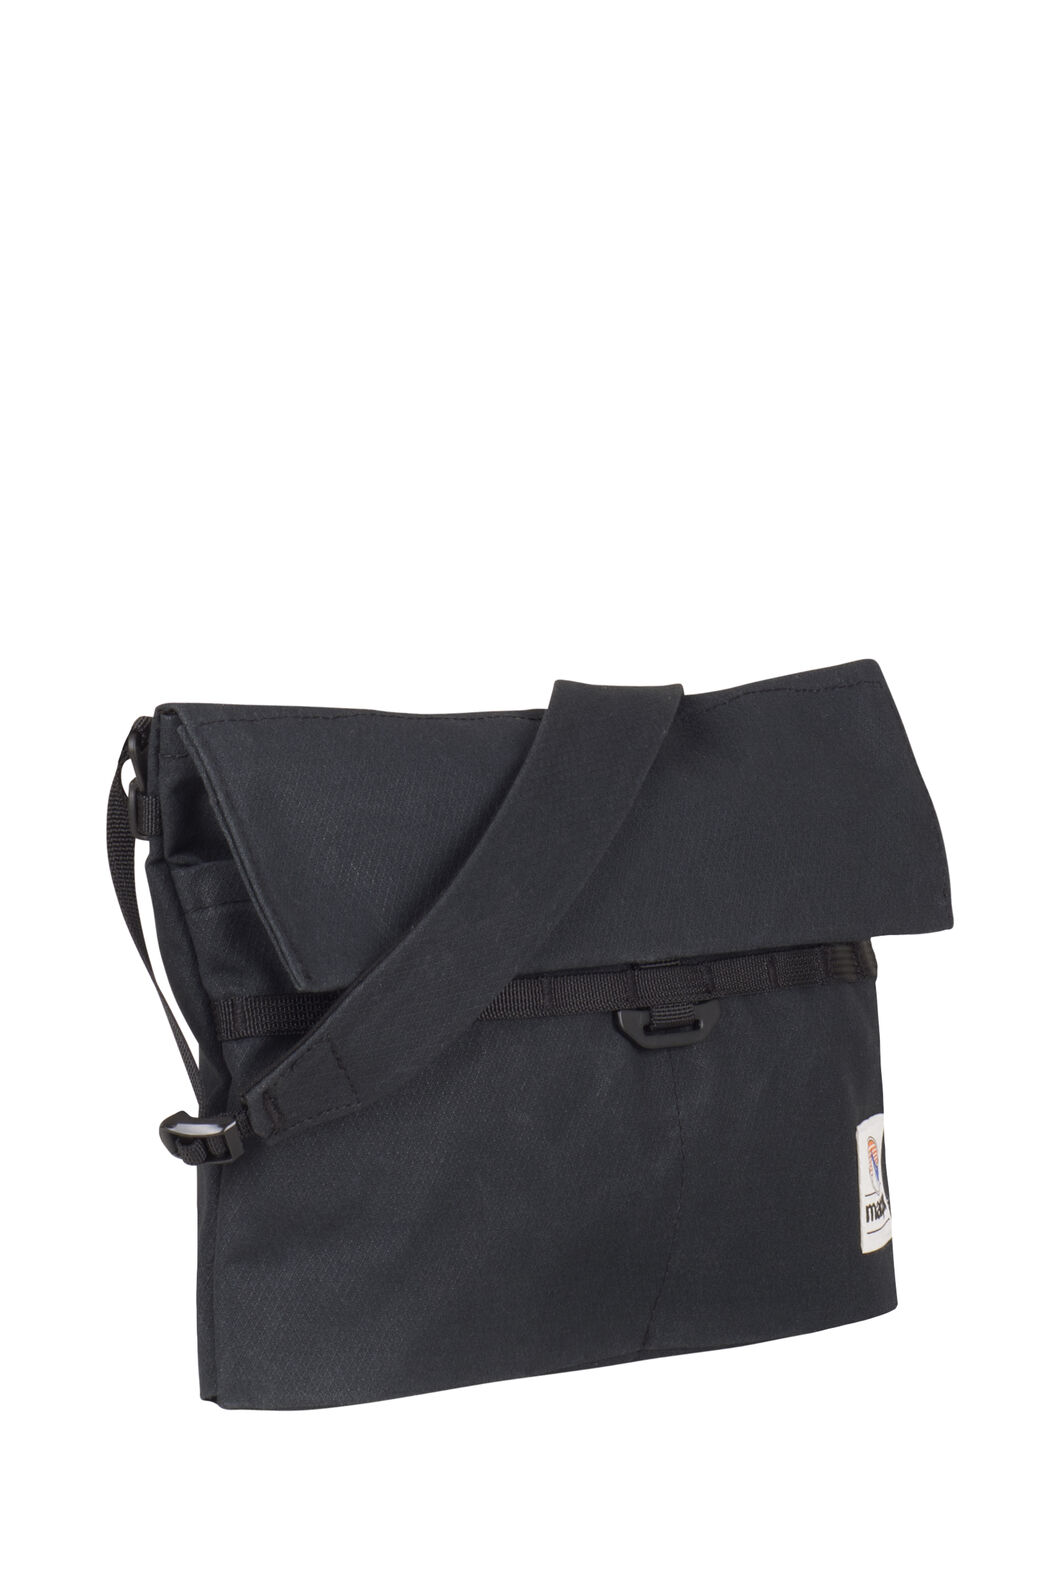 Macpac Musette AzTec® 3L Travel Bag, Black, hi-res